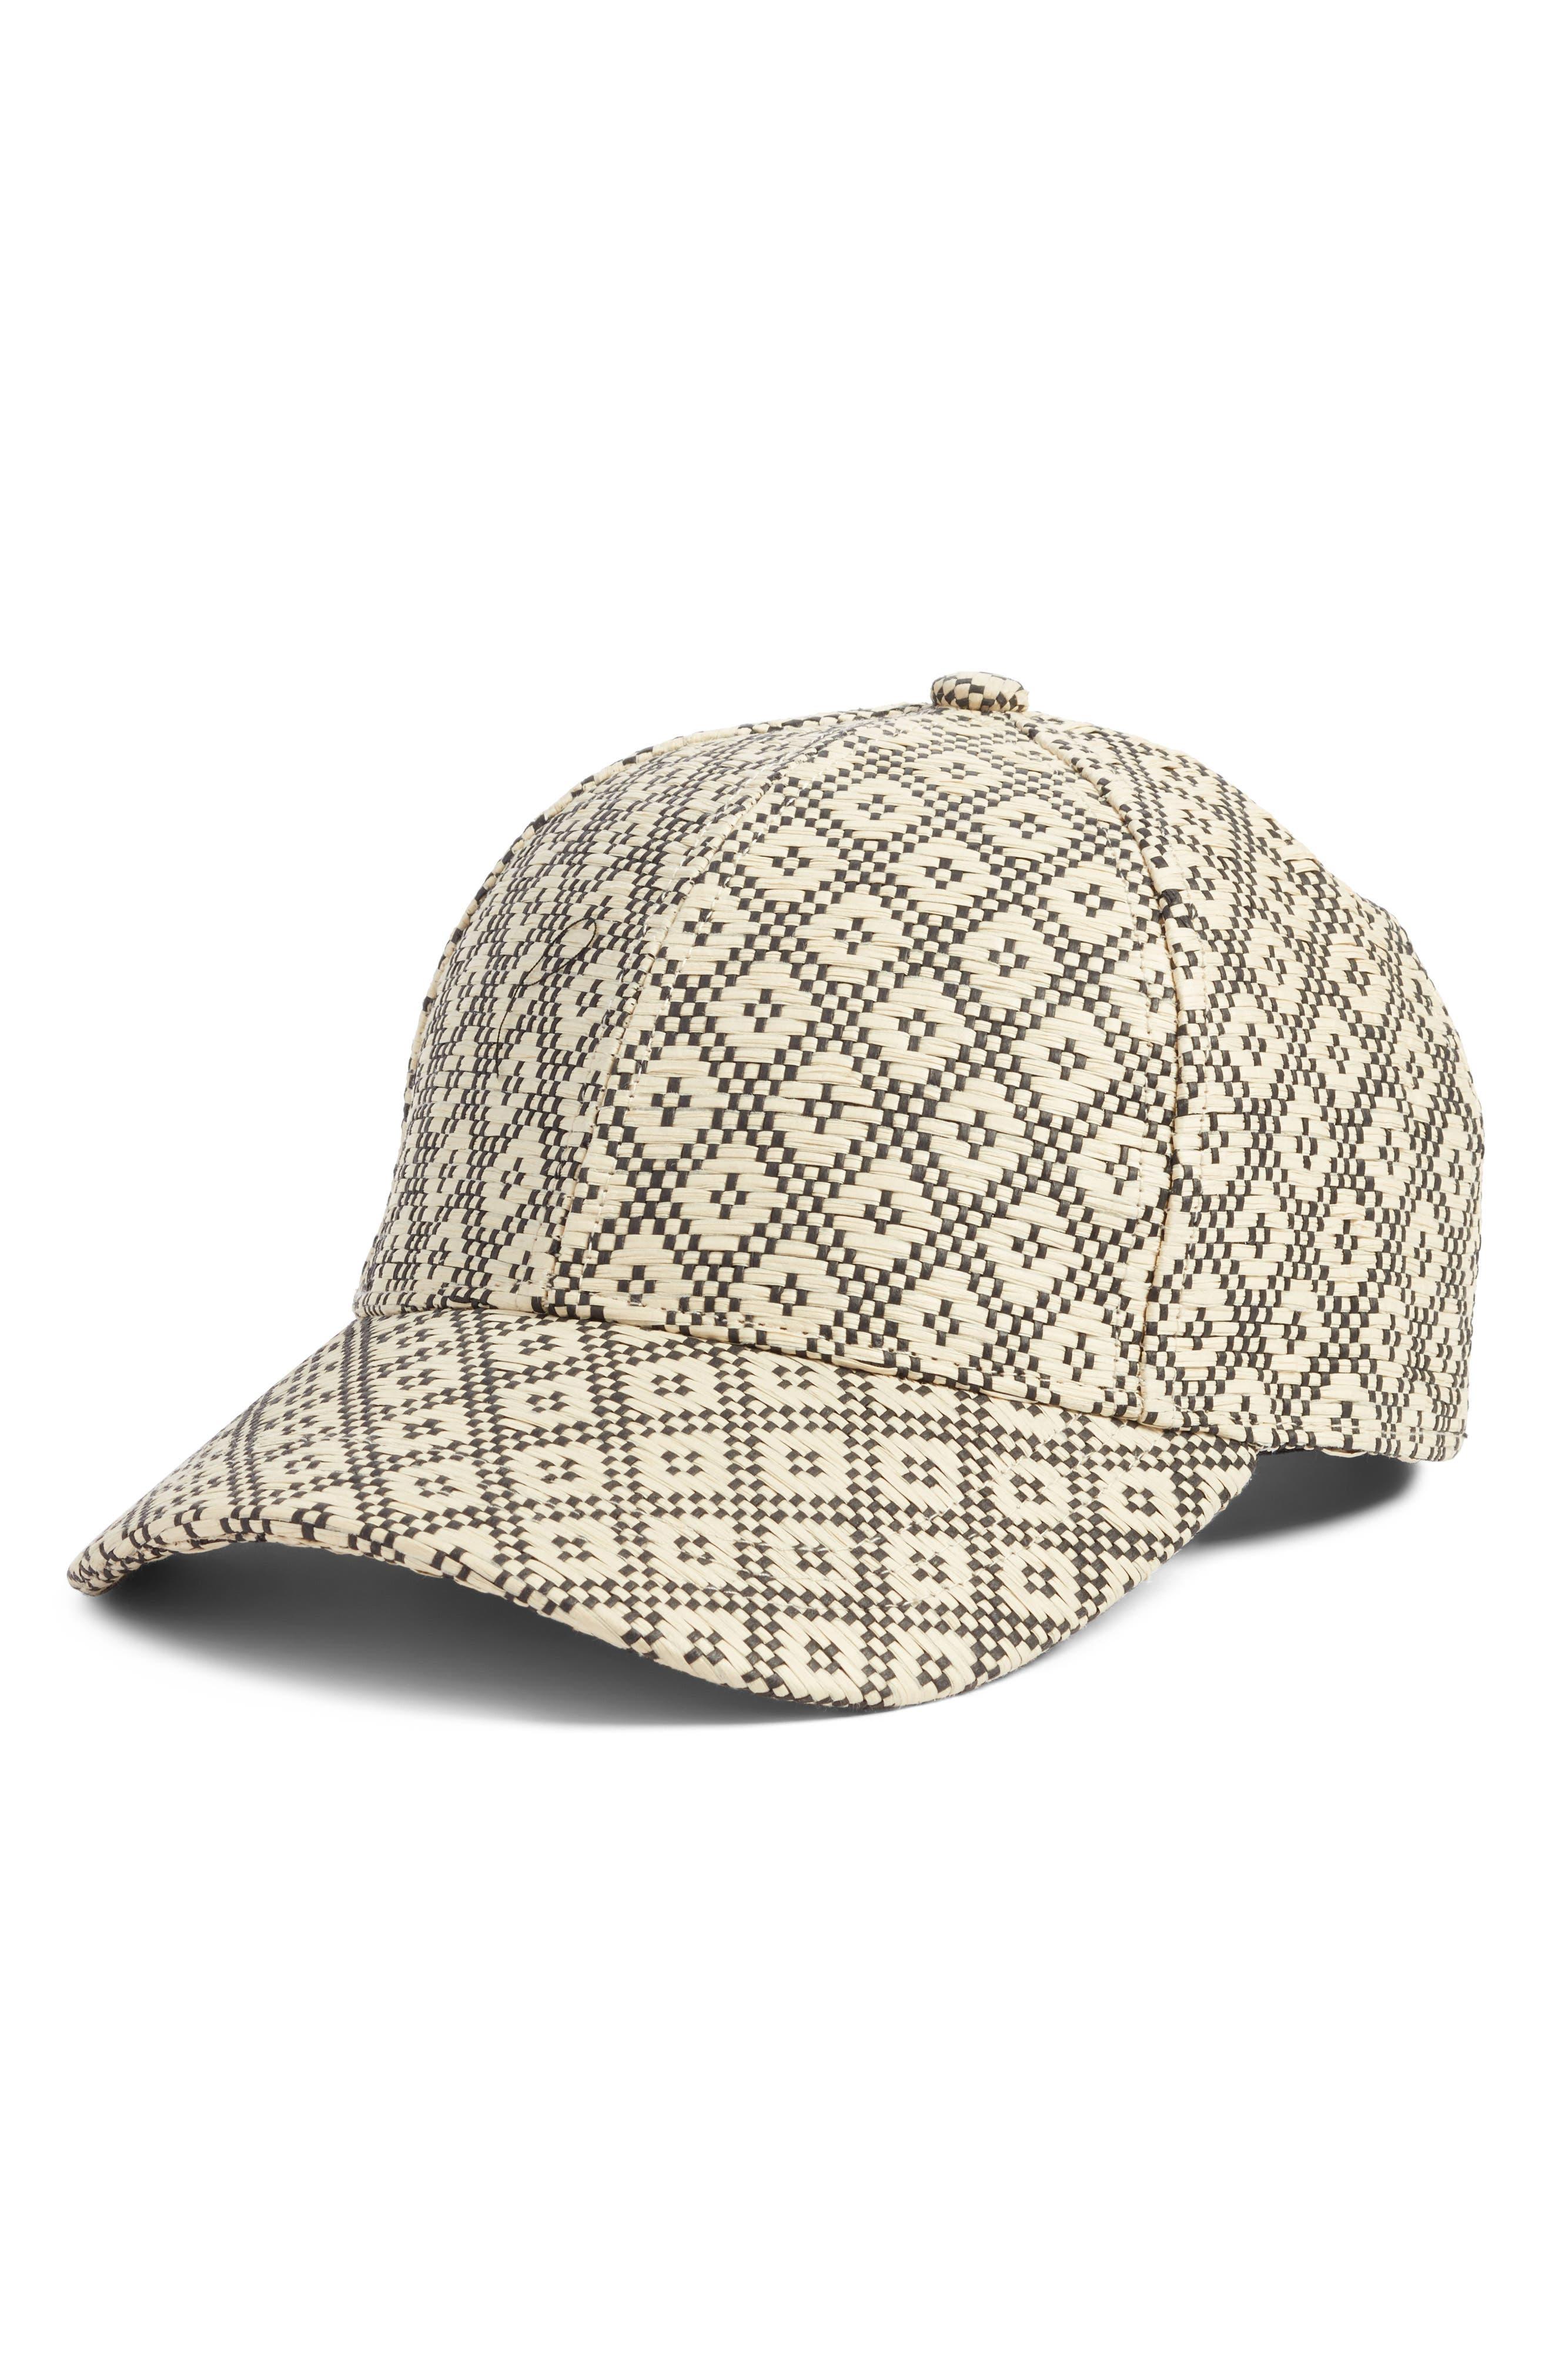 August Hat Geo Straw Baseball Cap